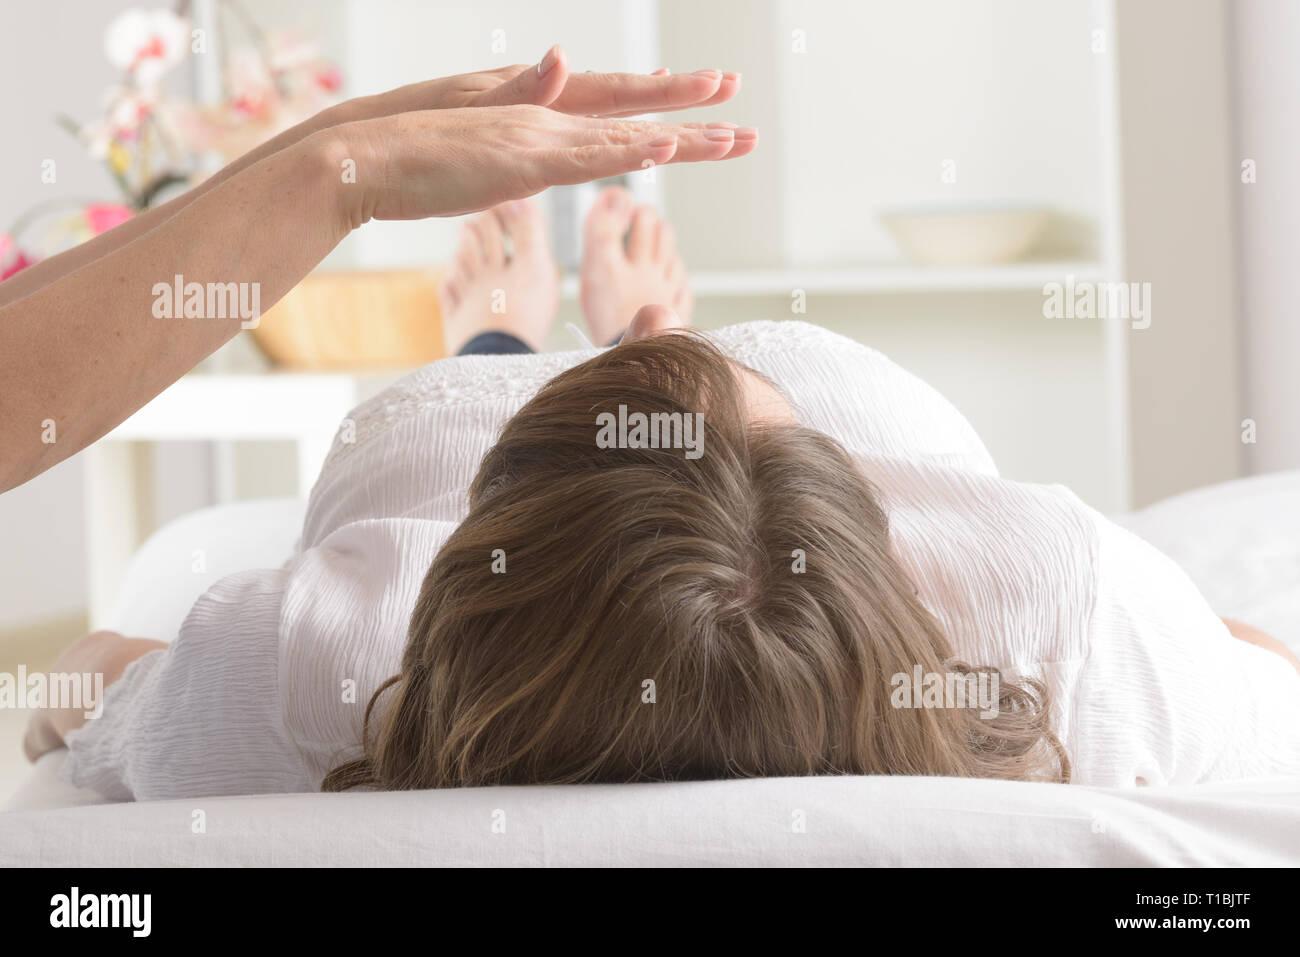 Professional Reiki healer doing reiki treatment to young woman - Stock Image